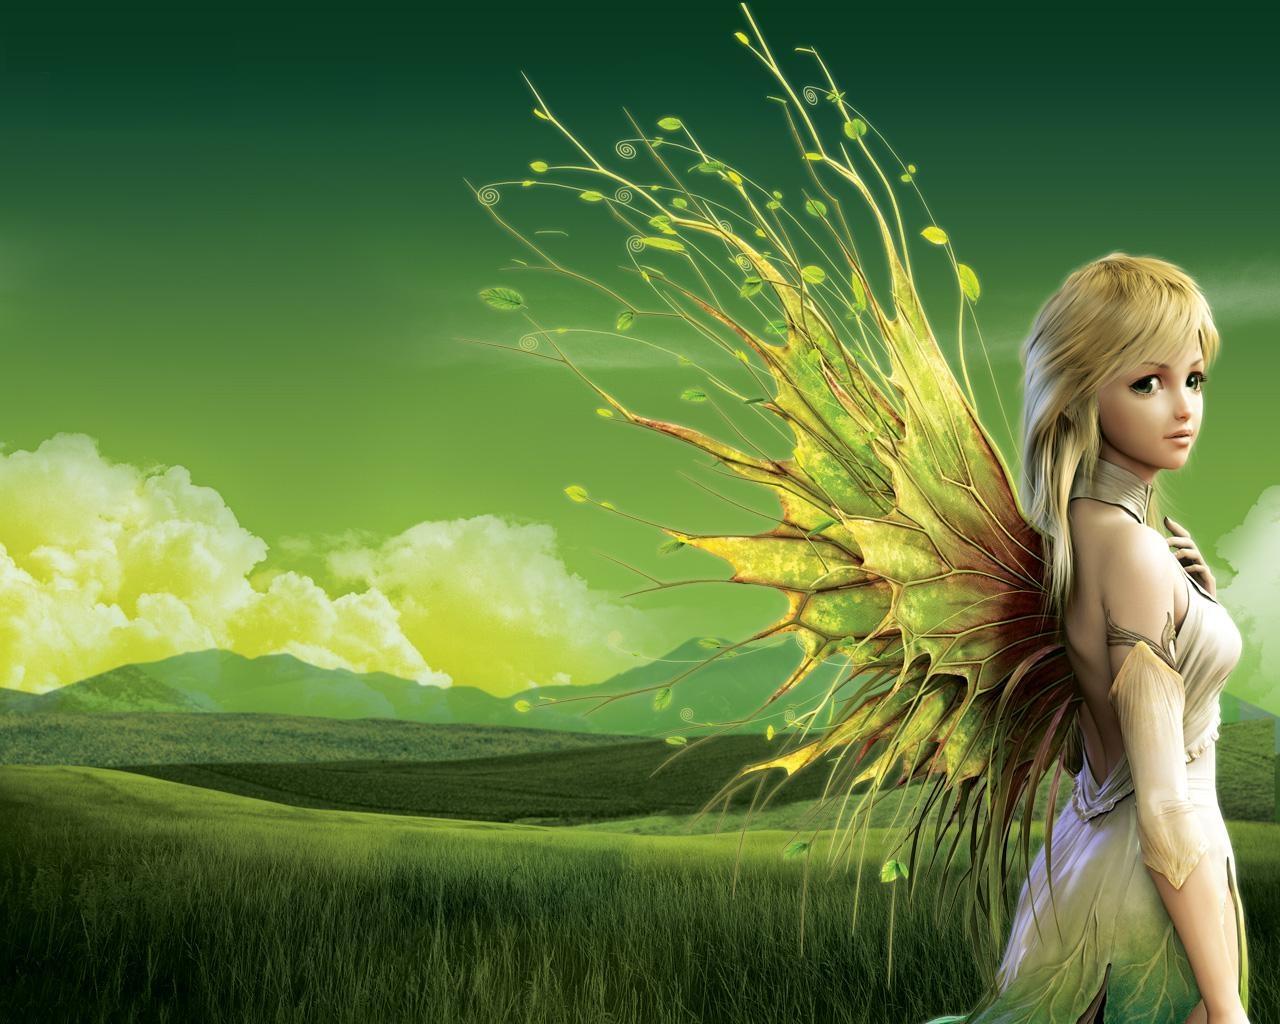 Fairy Computer Wallpapers Desktop Backgrounds 1280x1024 ID111470 1280x1024